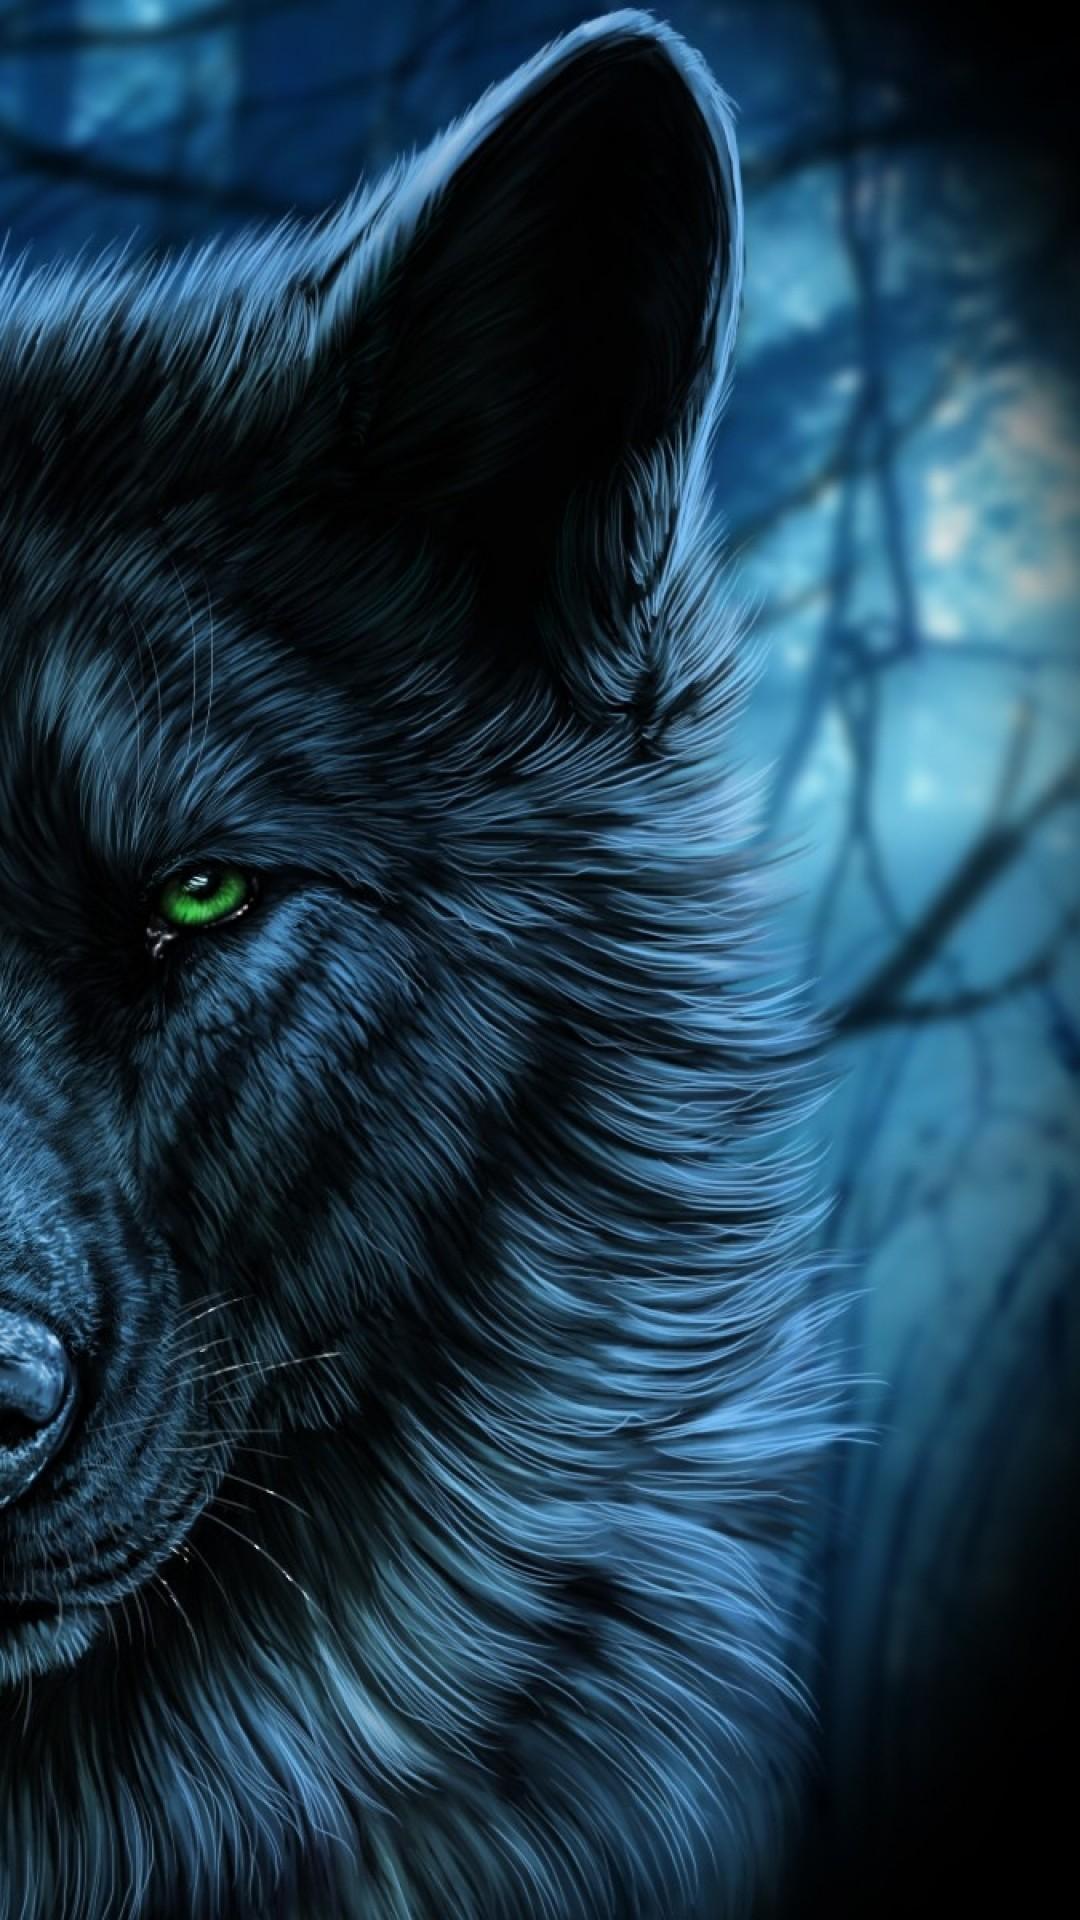 Starry Wolf Wallpaper